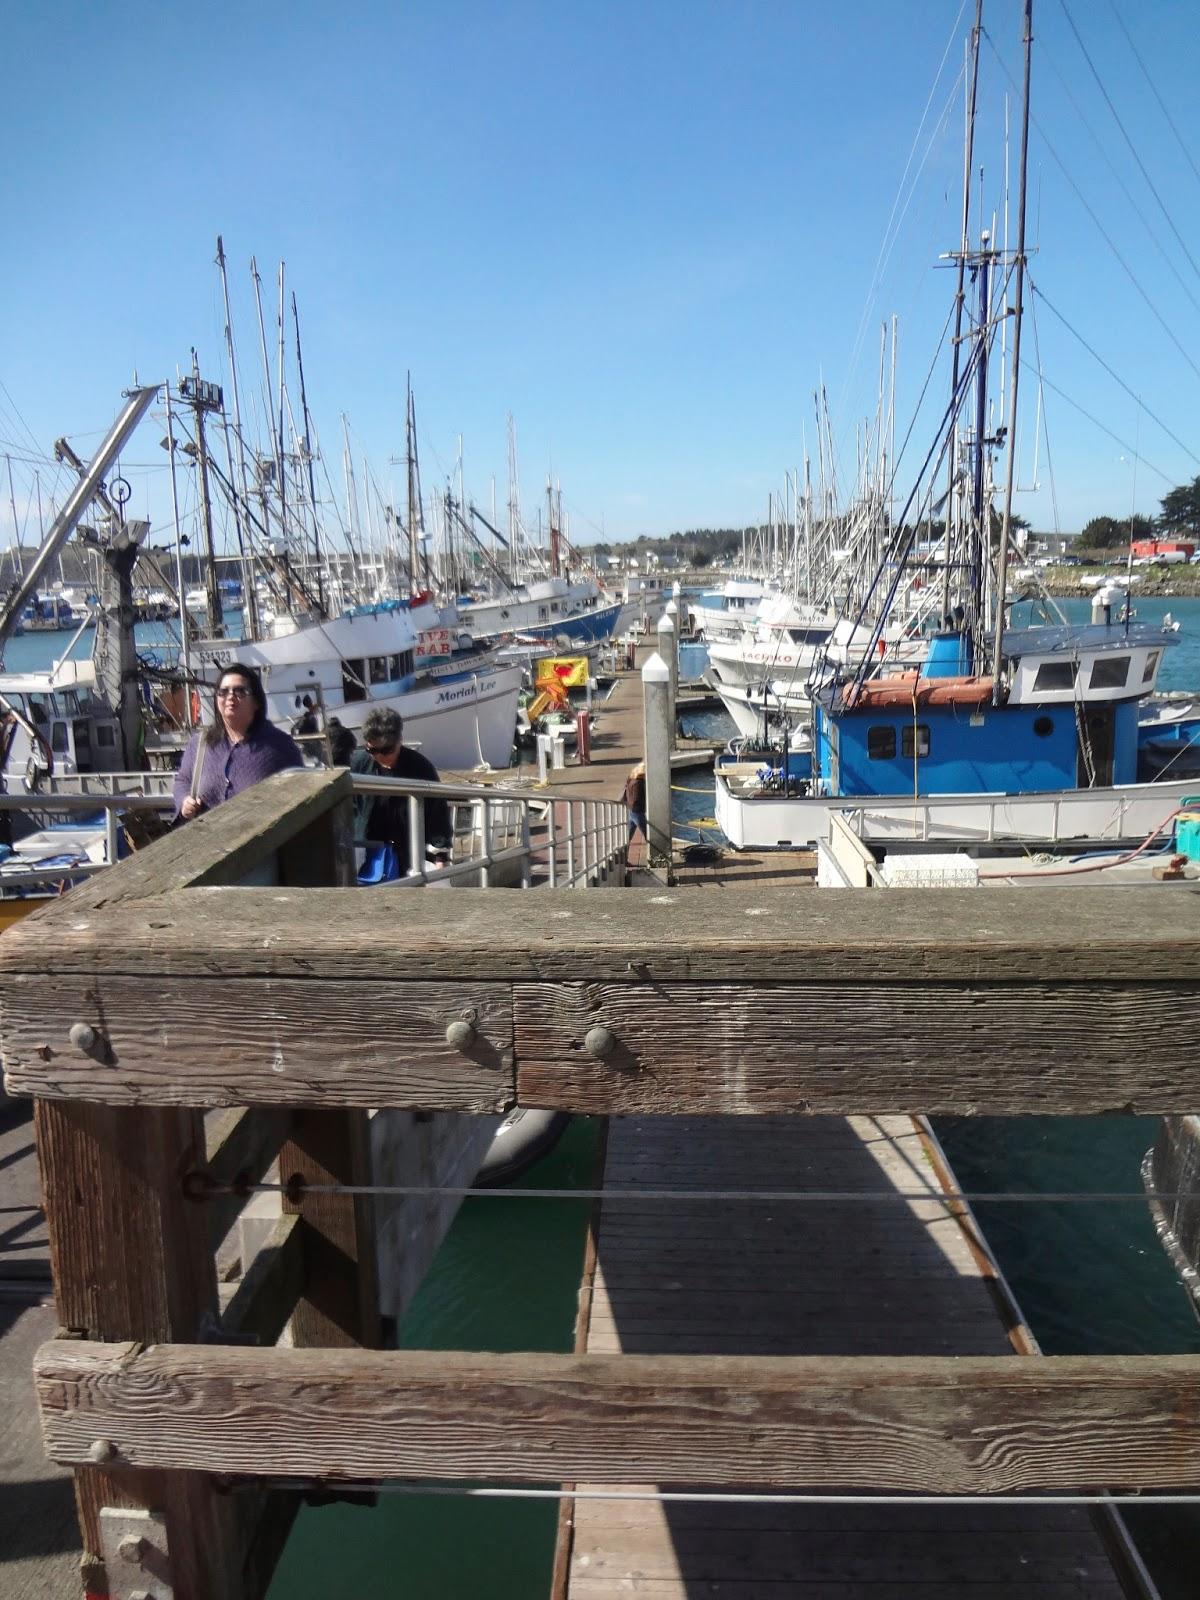 Honeylust destination x hidden gems near san francisco for Half moon bay pier fishing